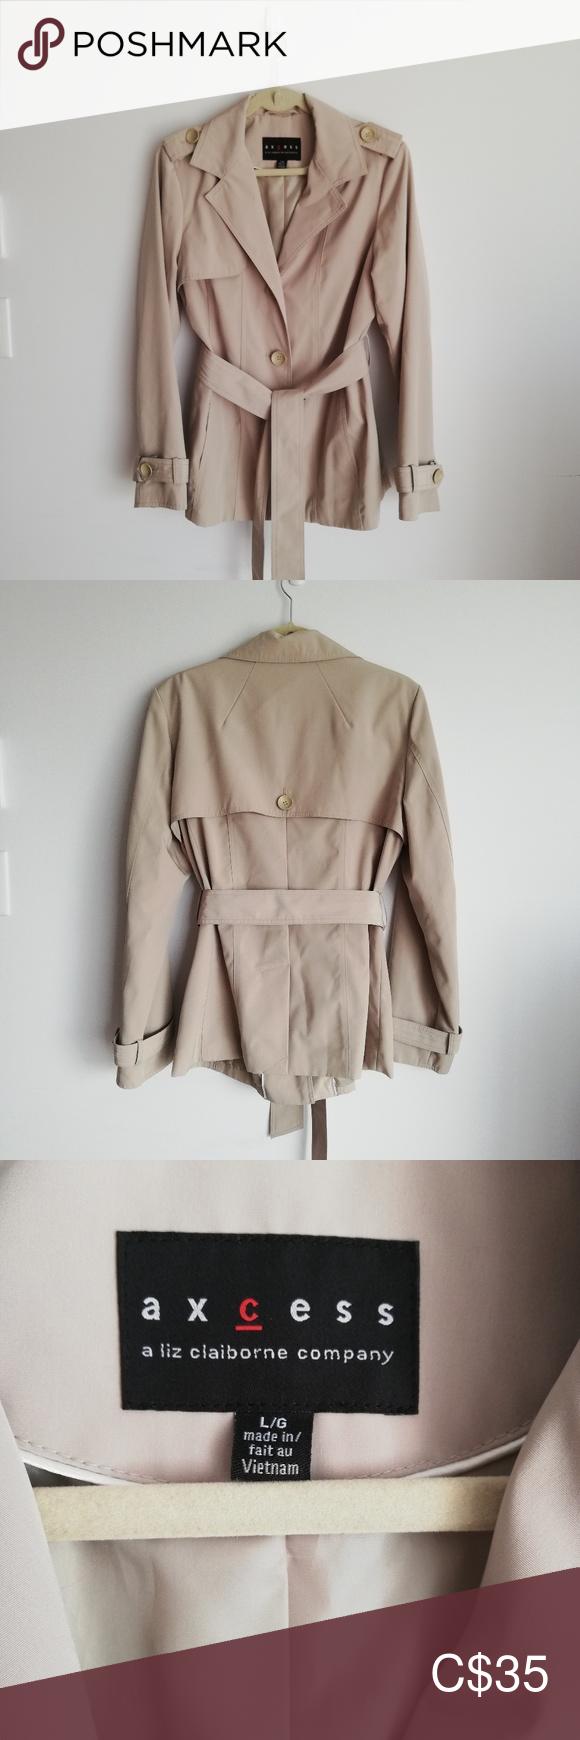 Liz Claiborne Axcess Trench Coat Jacket Sz Medium Trench Coat Jackets Liz Claiborne Claiborne [ 1740 x 580 Pixel ]